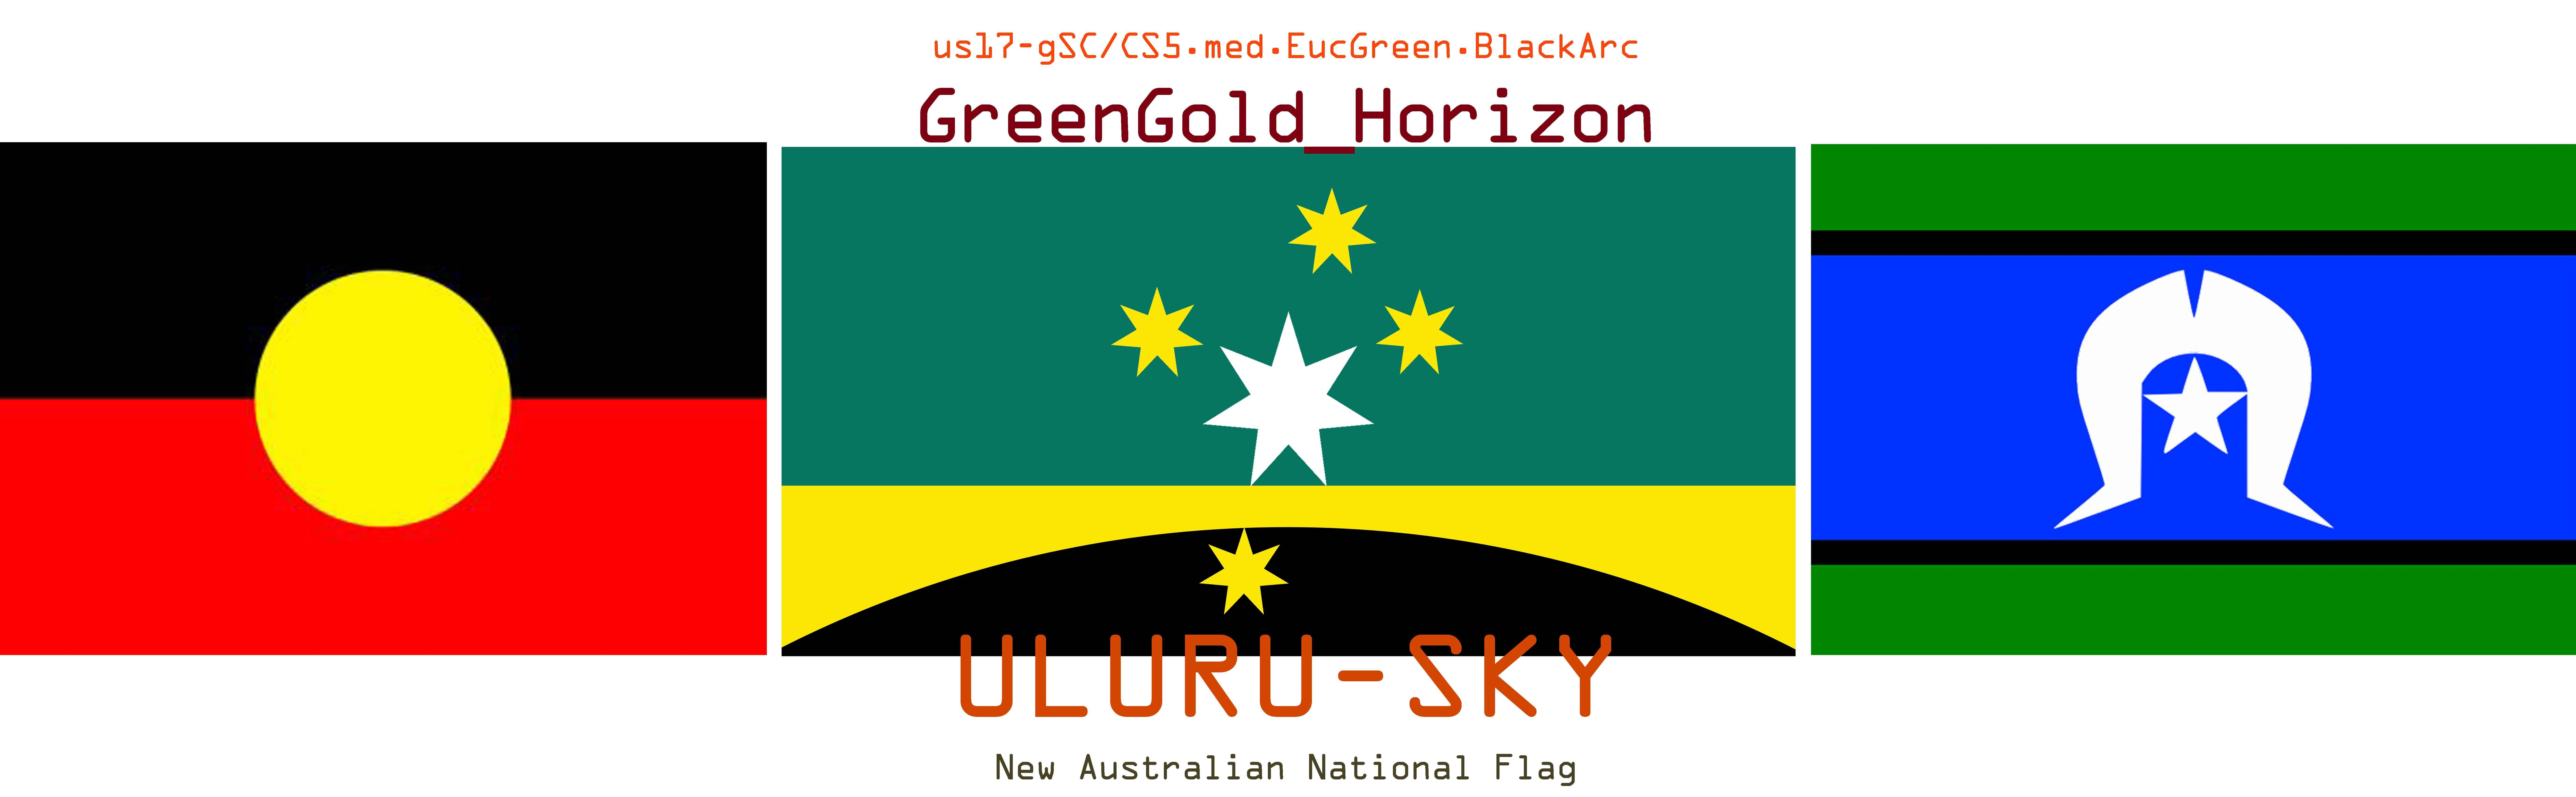 Imgur In 2020 Australian Flag Ideas National Flag Australian Flags